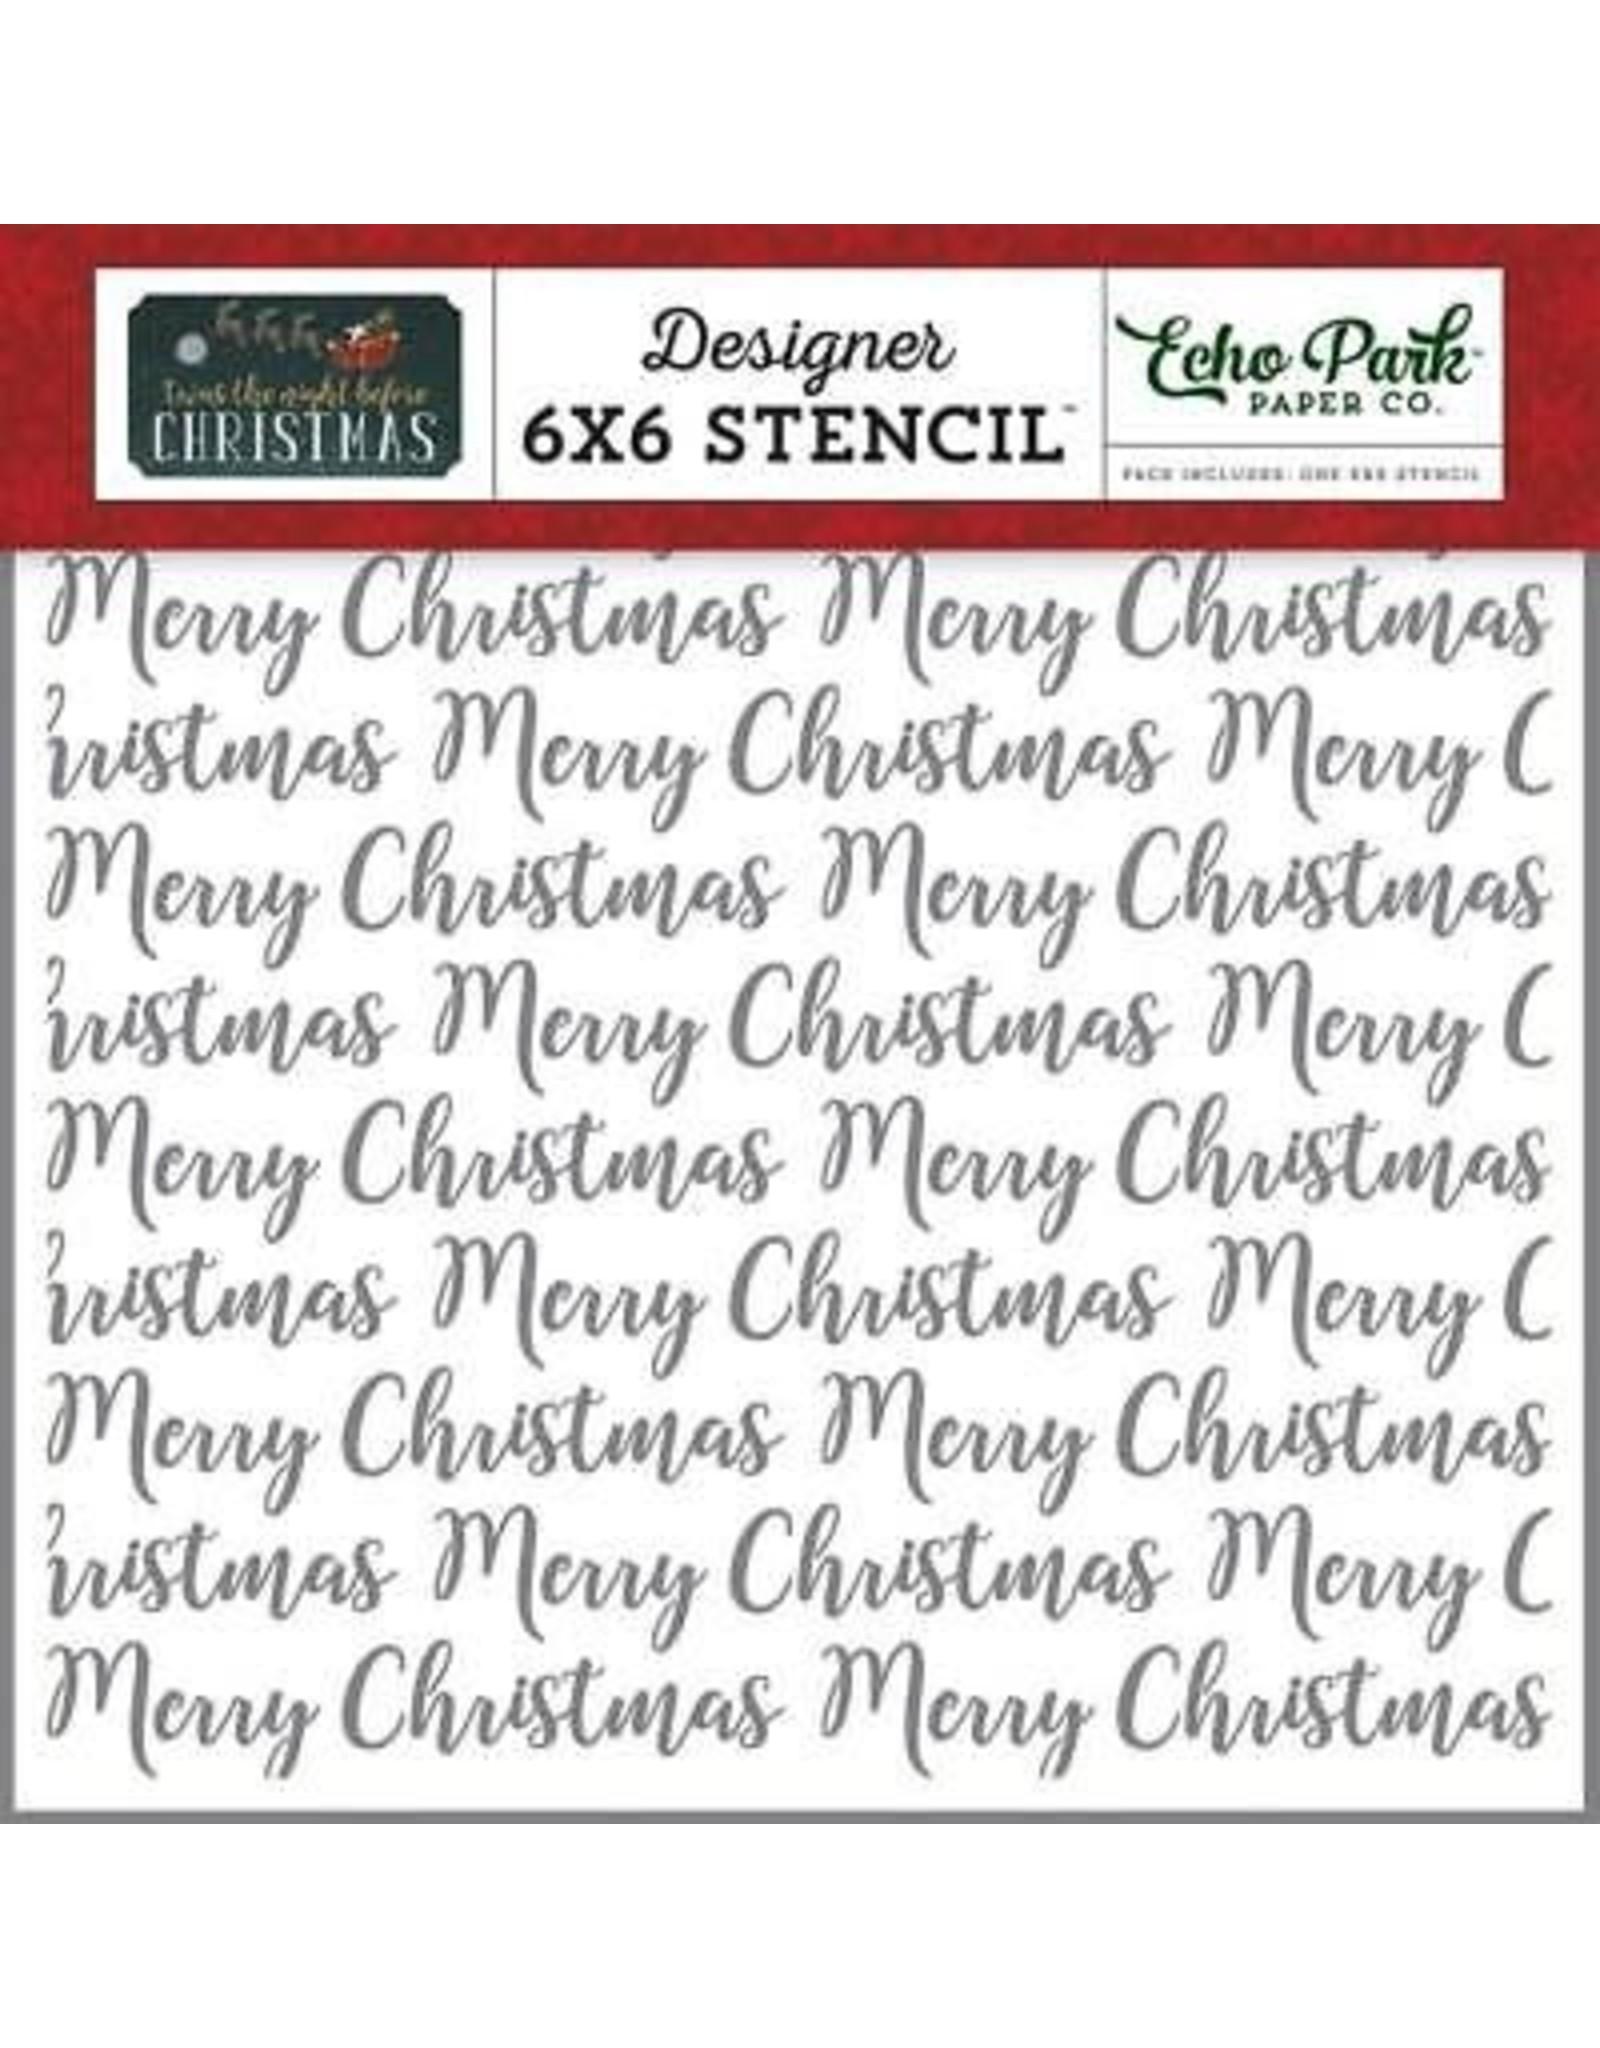 Echo Park Merry Christmas Word - 6x6 Stencil set